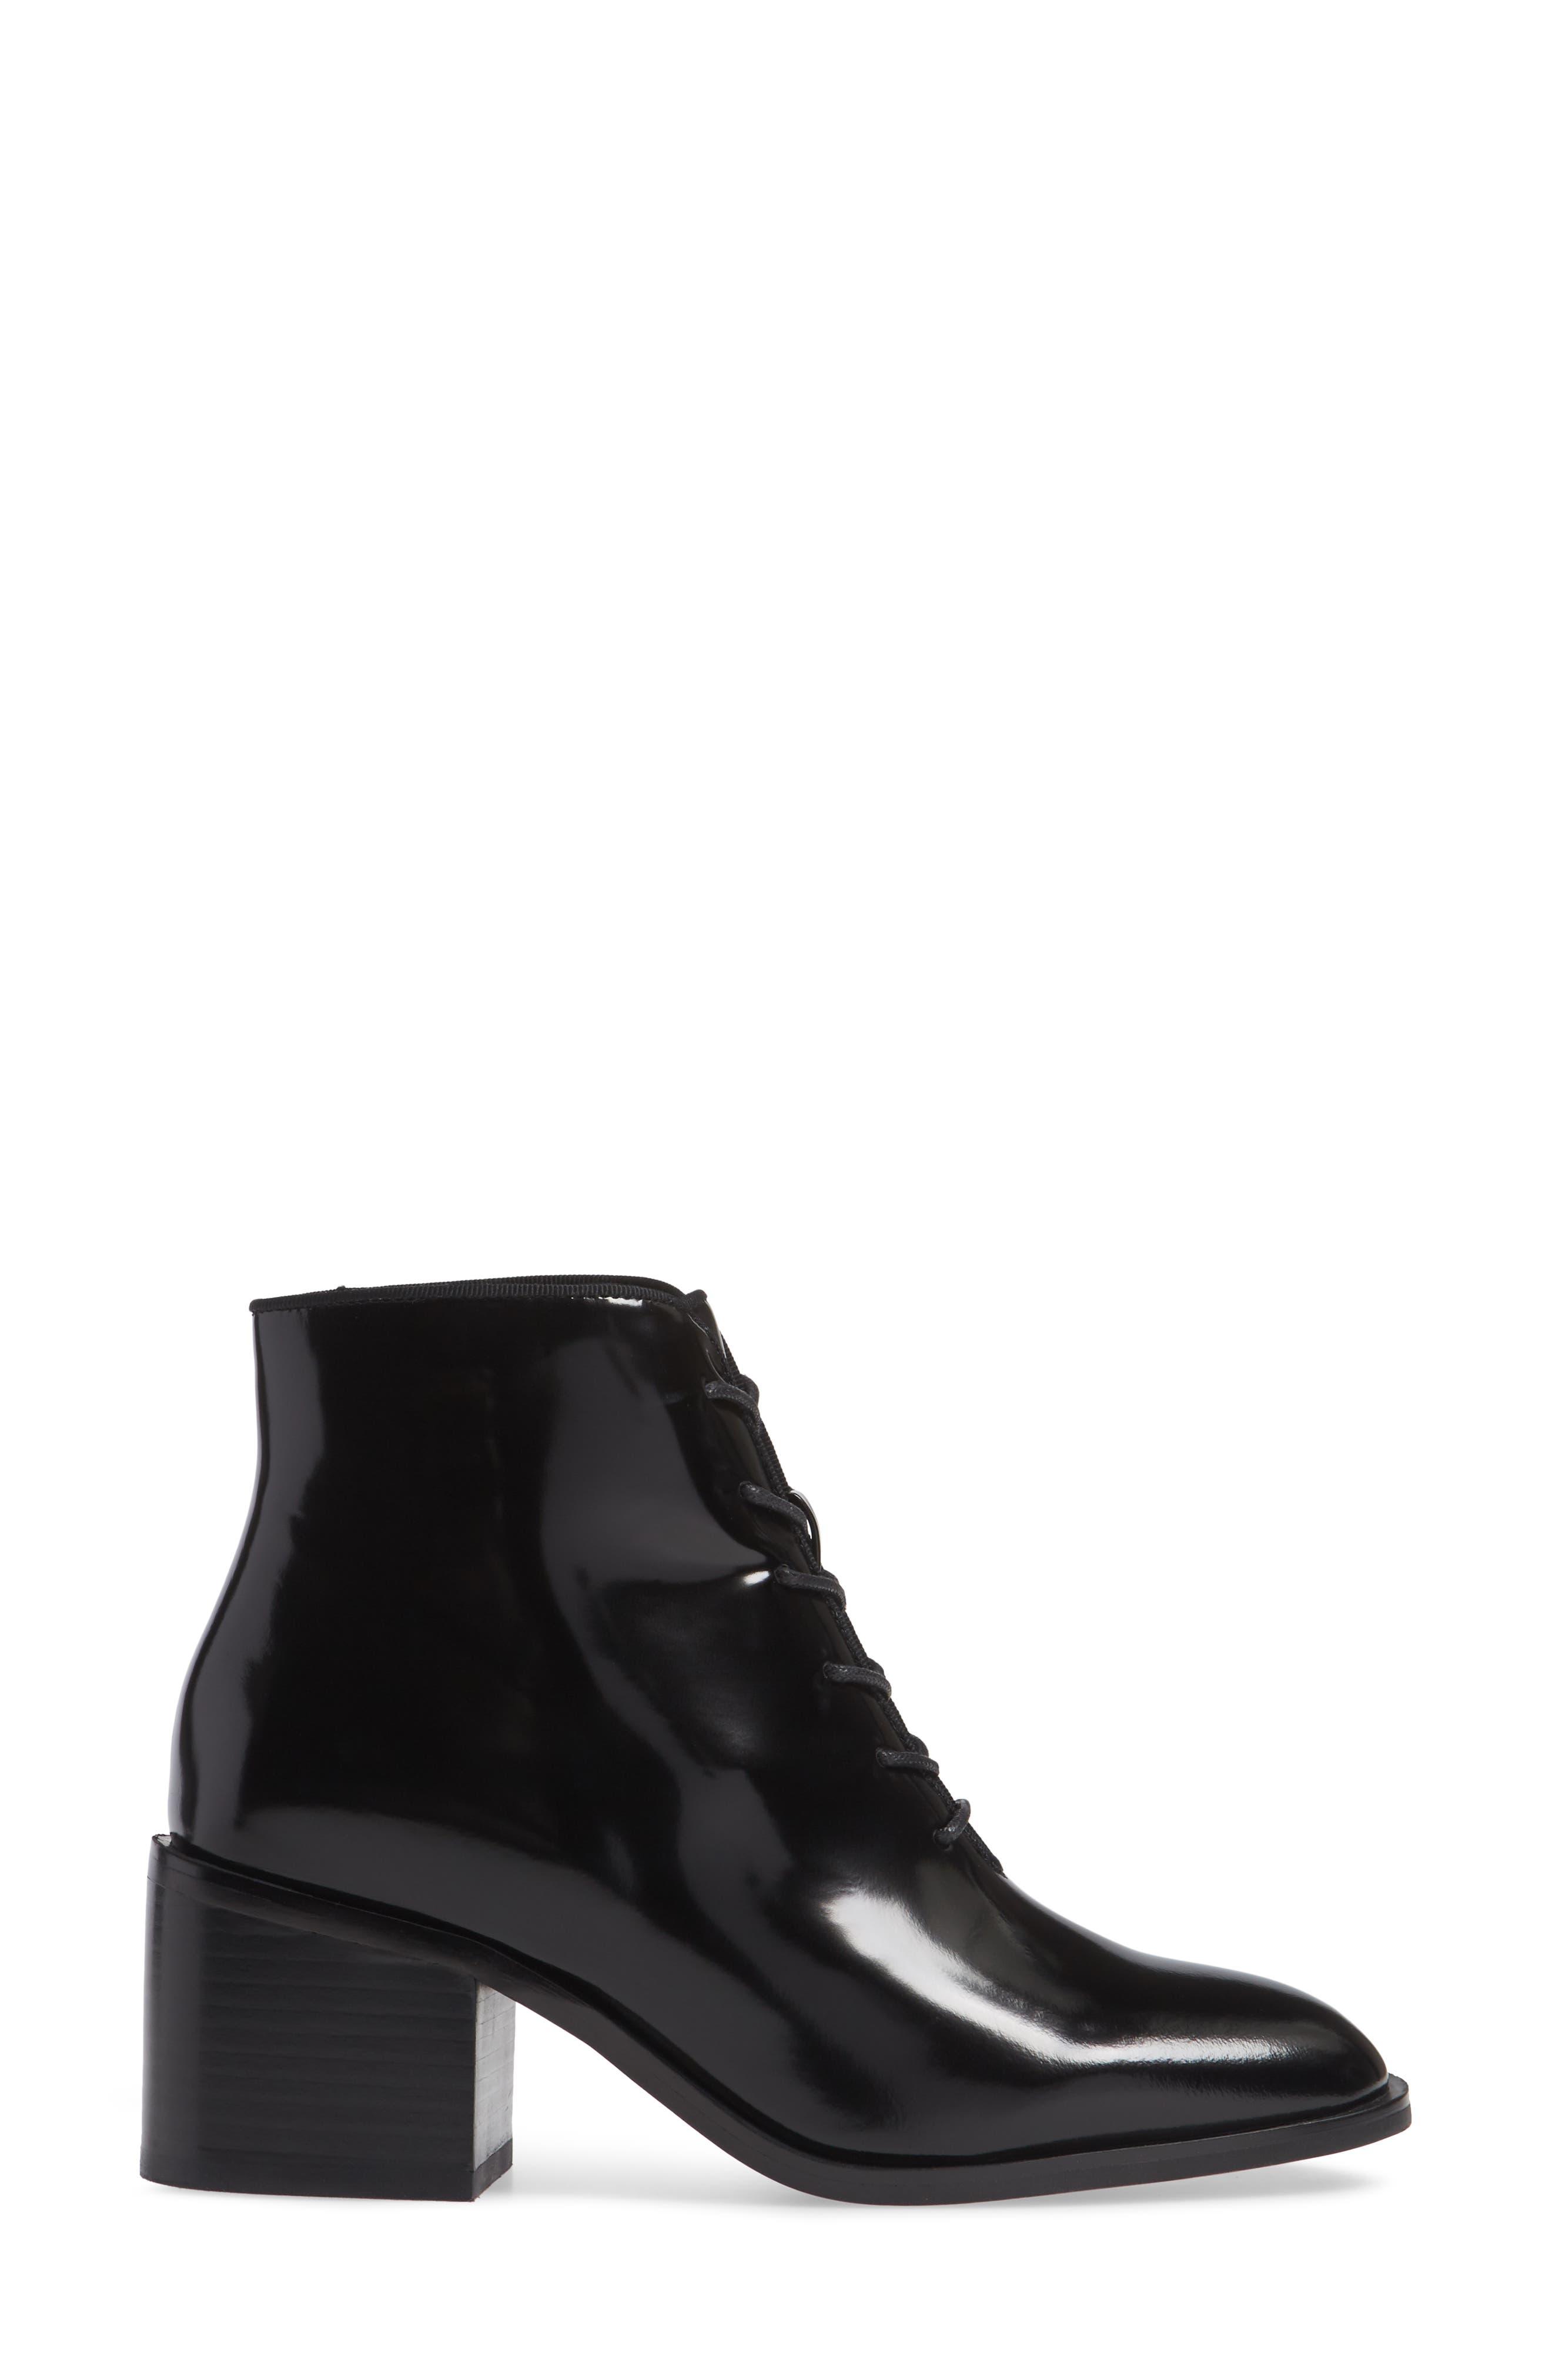 JEFFREY CAMPBELL, Talcott Block Heel Bootie, Alternate thumbnail 3, color, BLACK BOX